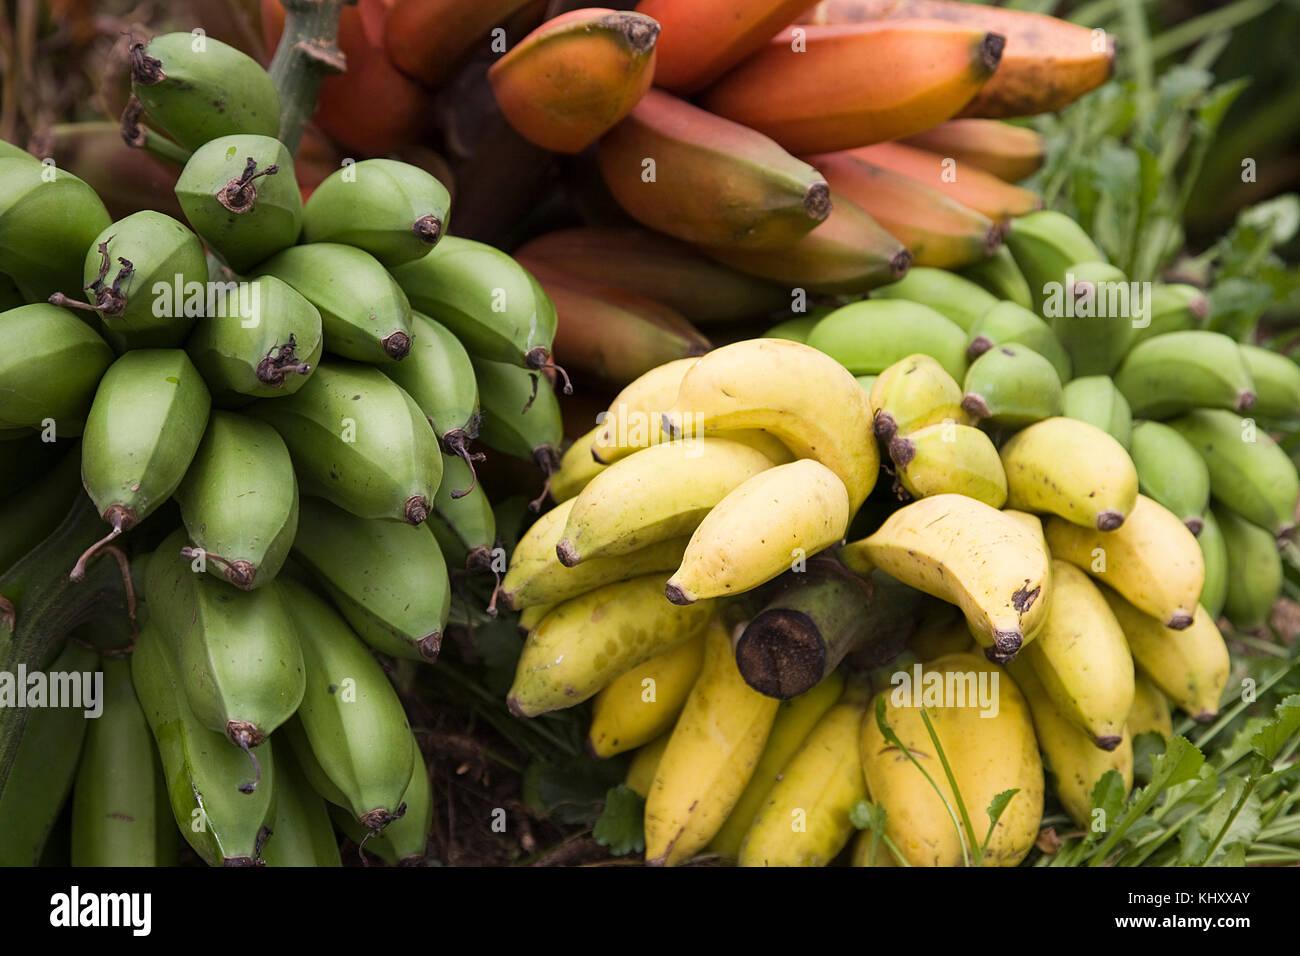 Bananas for cooking, close-up, Birayi, Bujumbura, Burundi, Africa - Stock Image